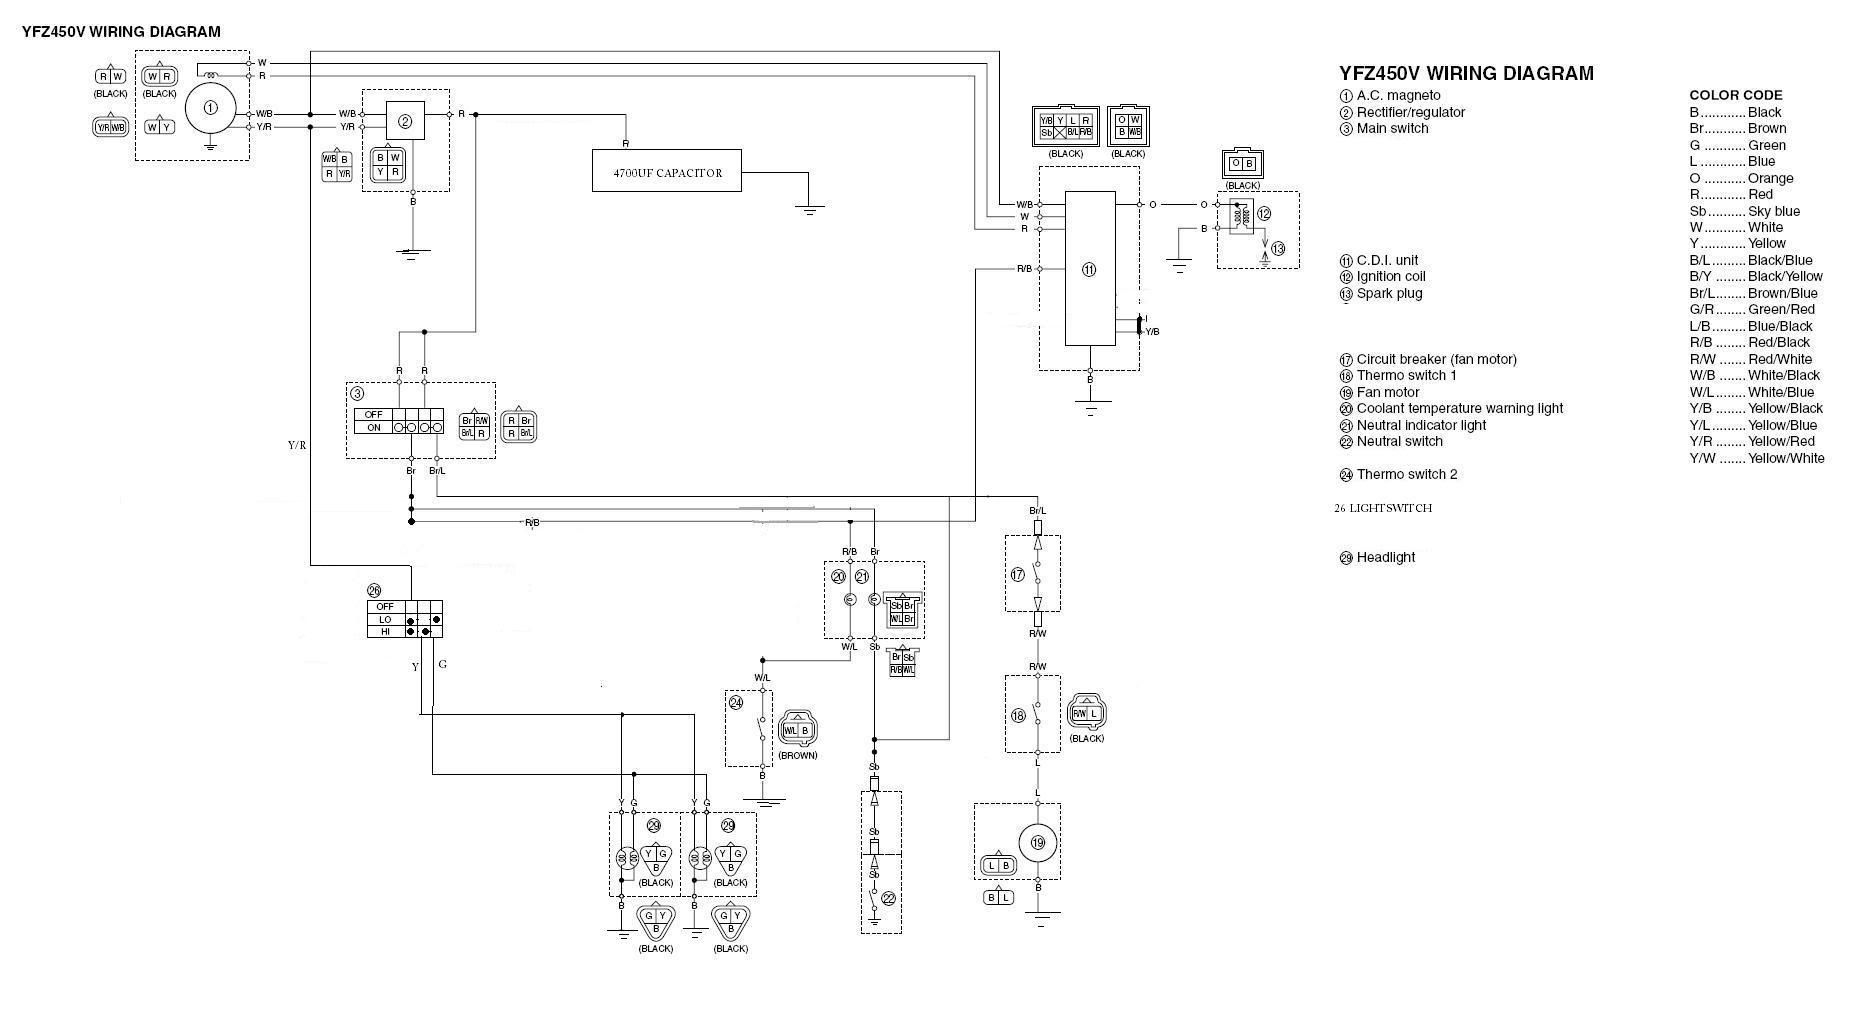 gutted harness diagrams yamaha yfz450 forum yfz450r throughout 05 yamaha yfz 450 wiring harness [ 1858 x 1009 Pixel ]